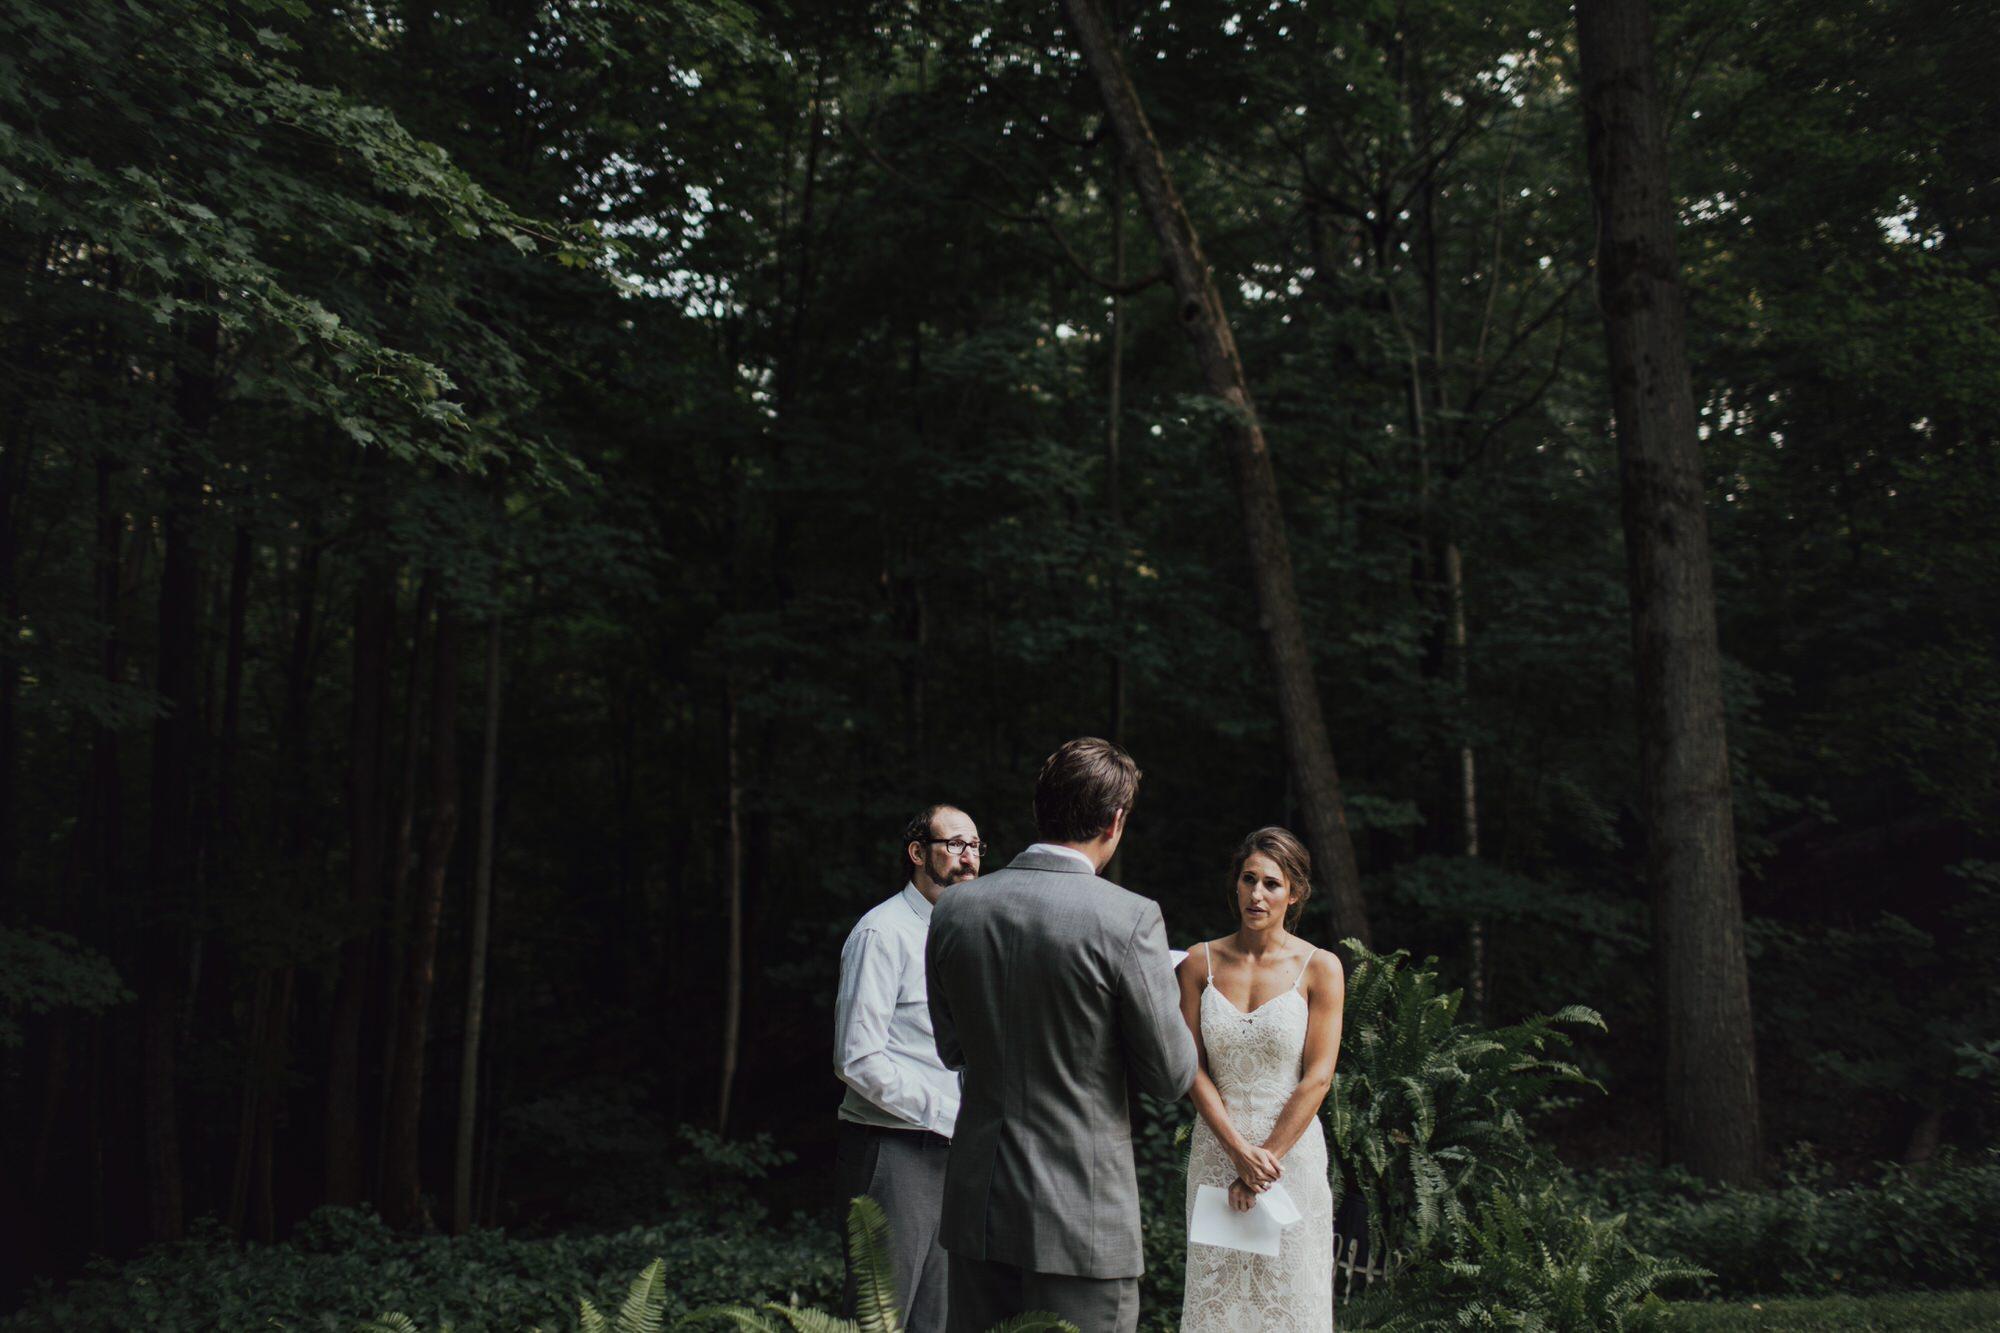 emily-aaron-rochester-new-york-wedding-photographer-73.JPG